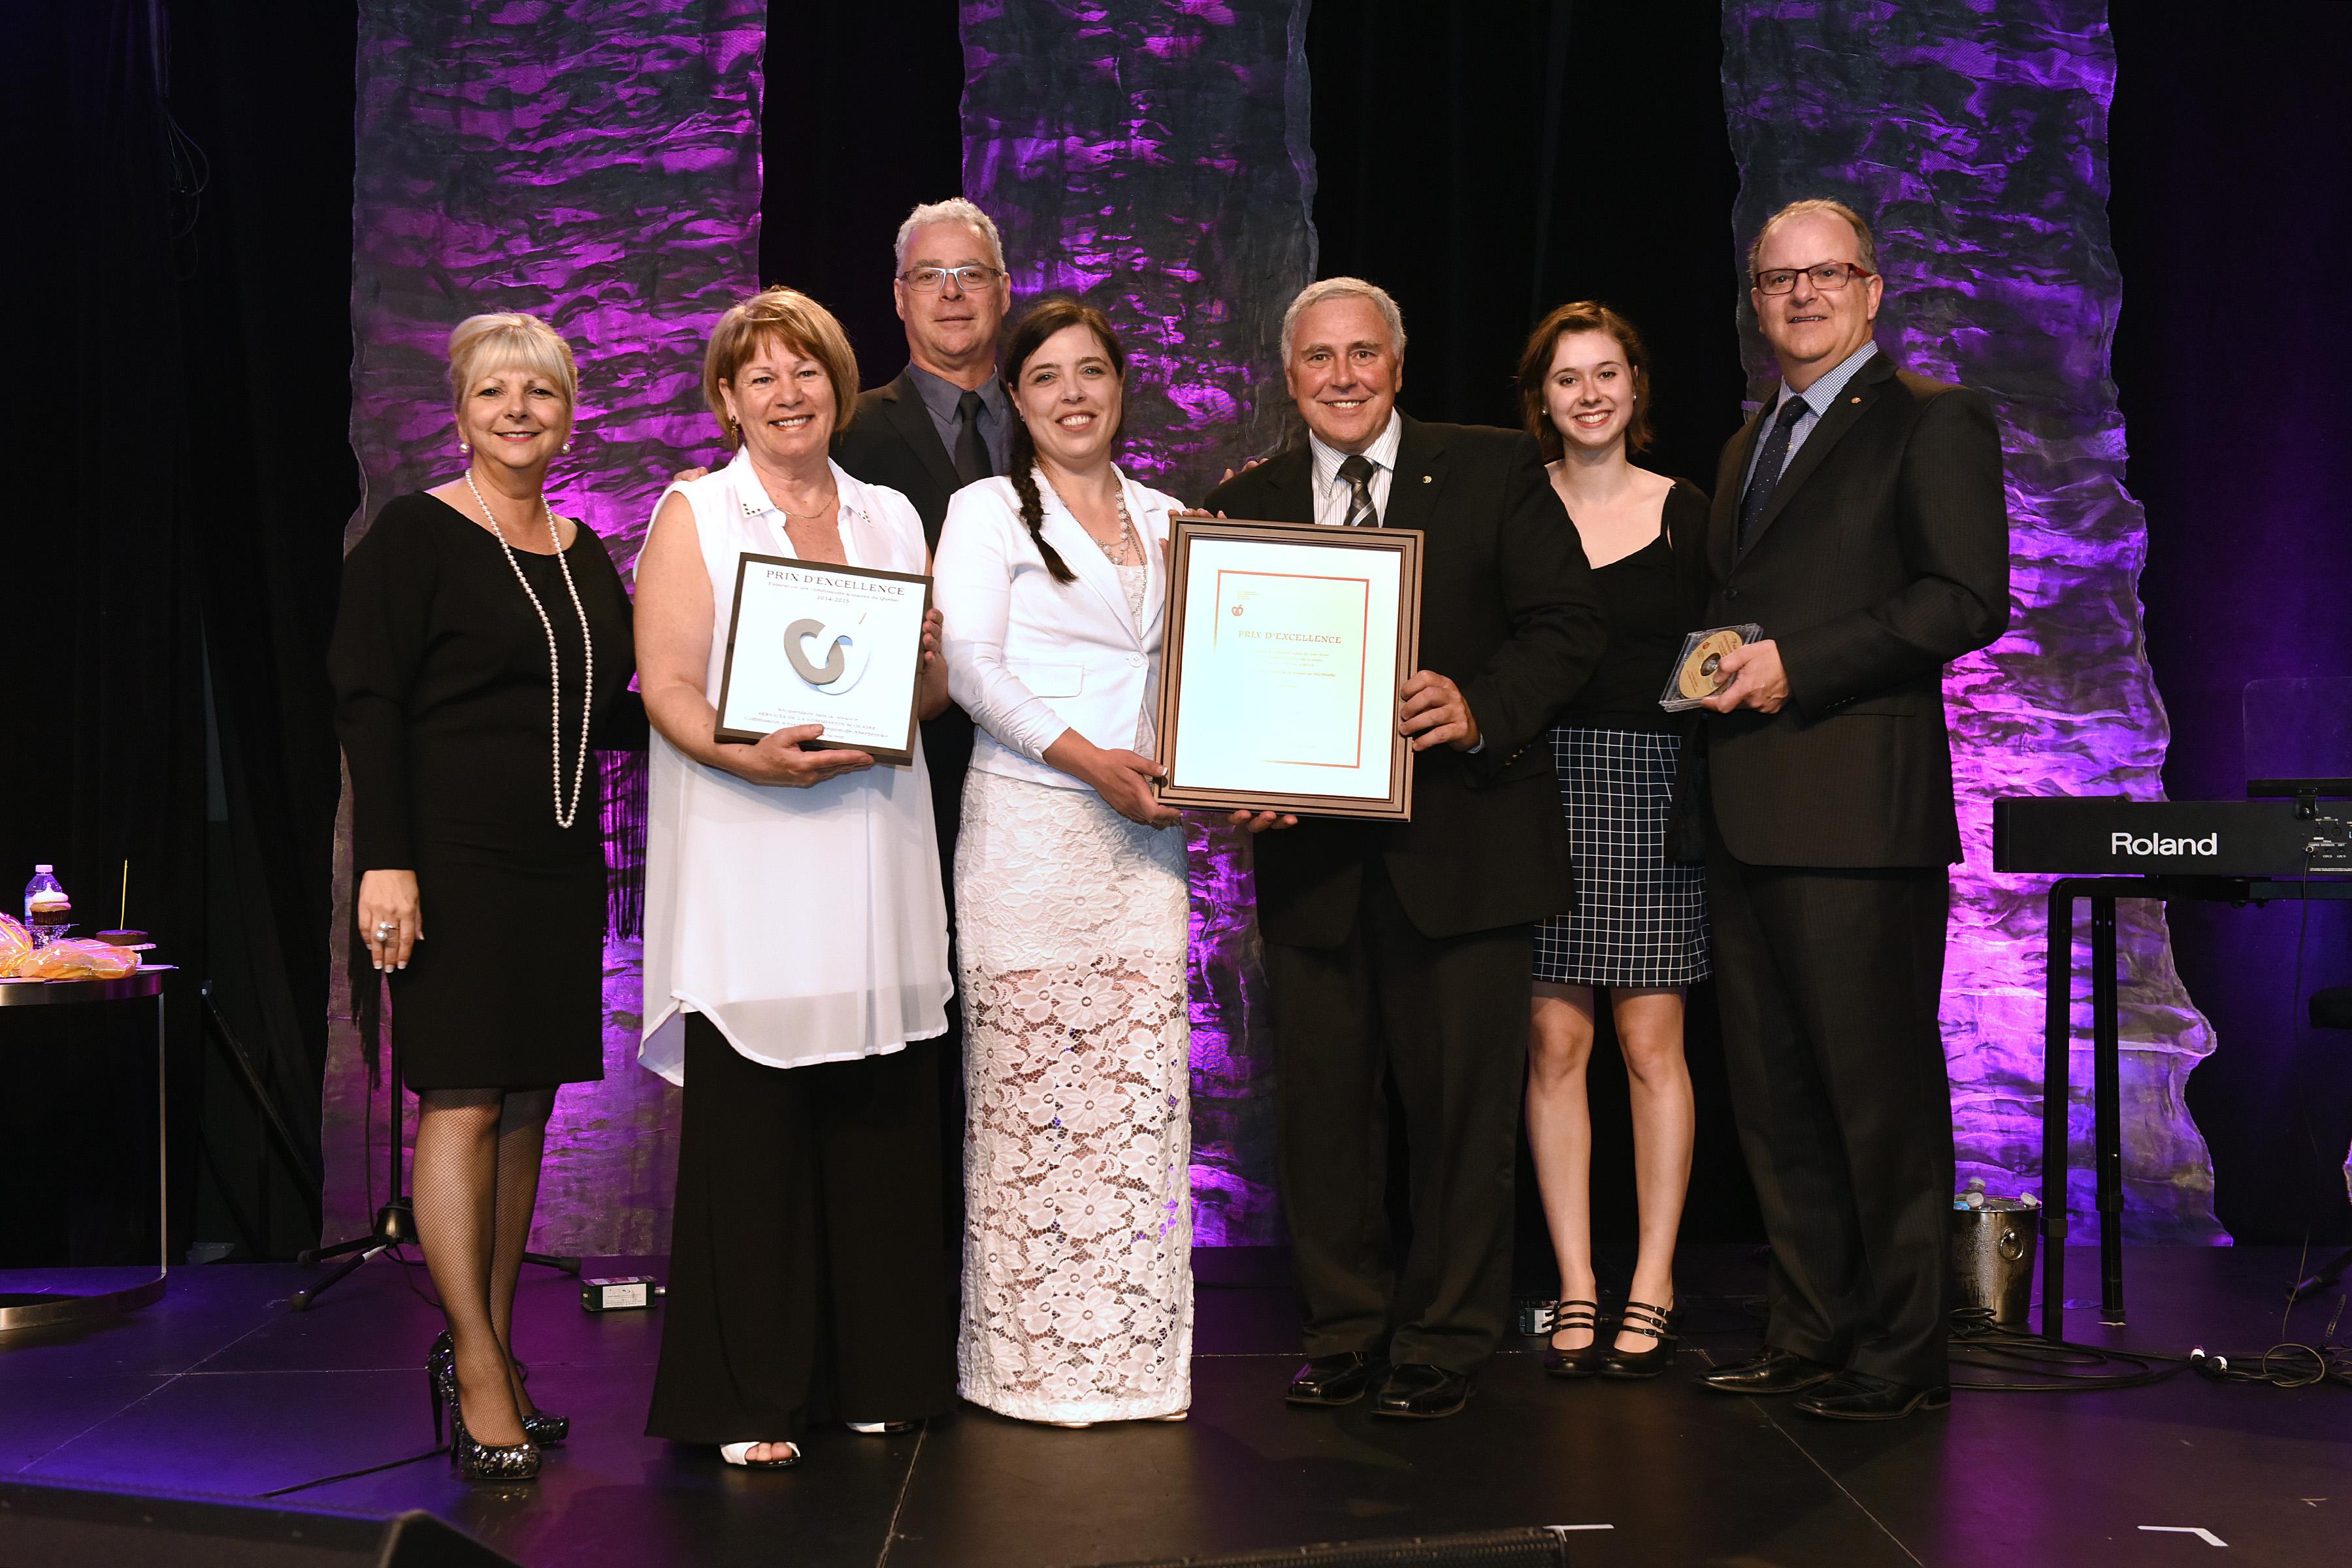 cs_sherbrooke-remise-prix-gala-2015